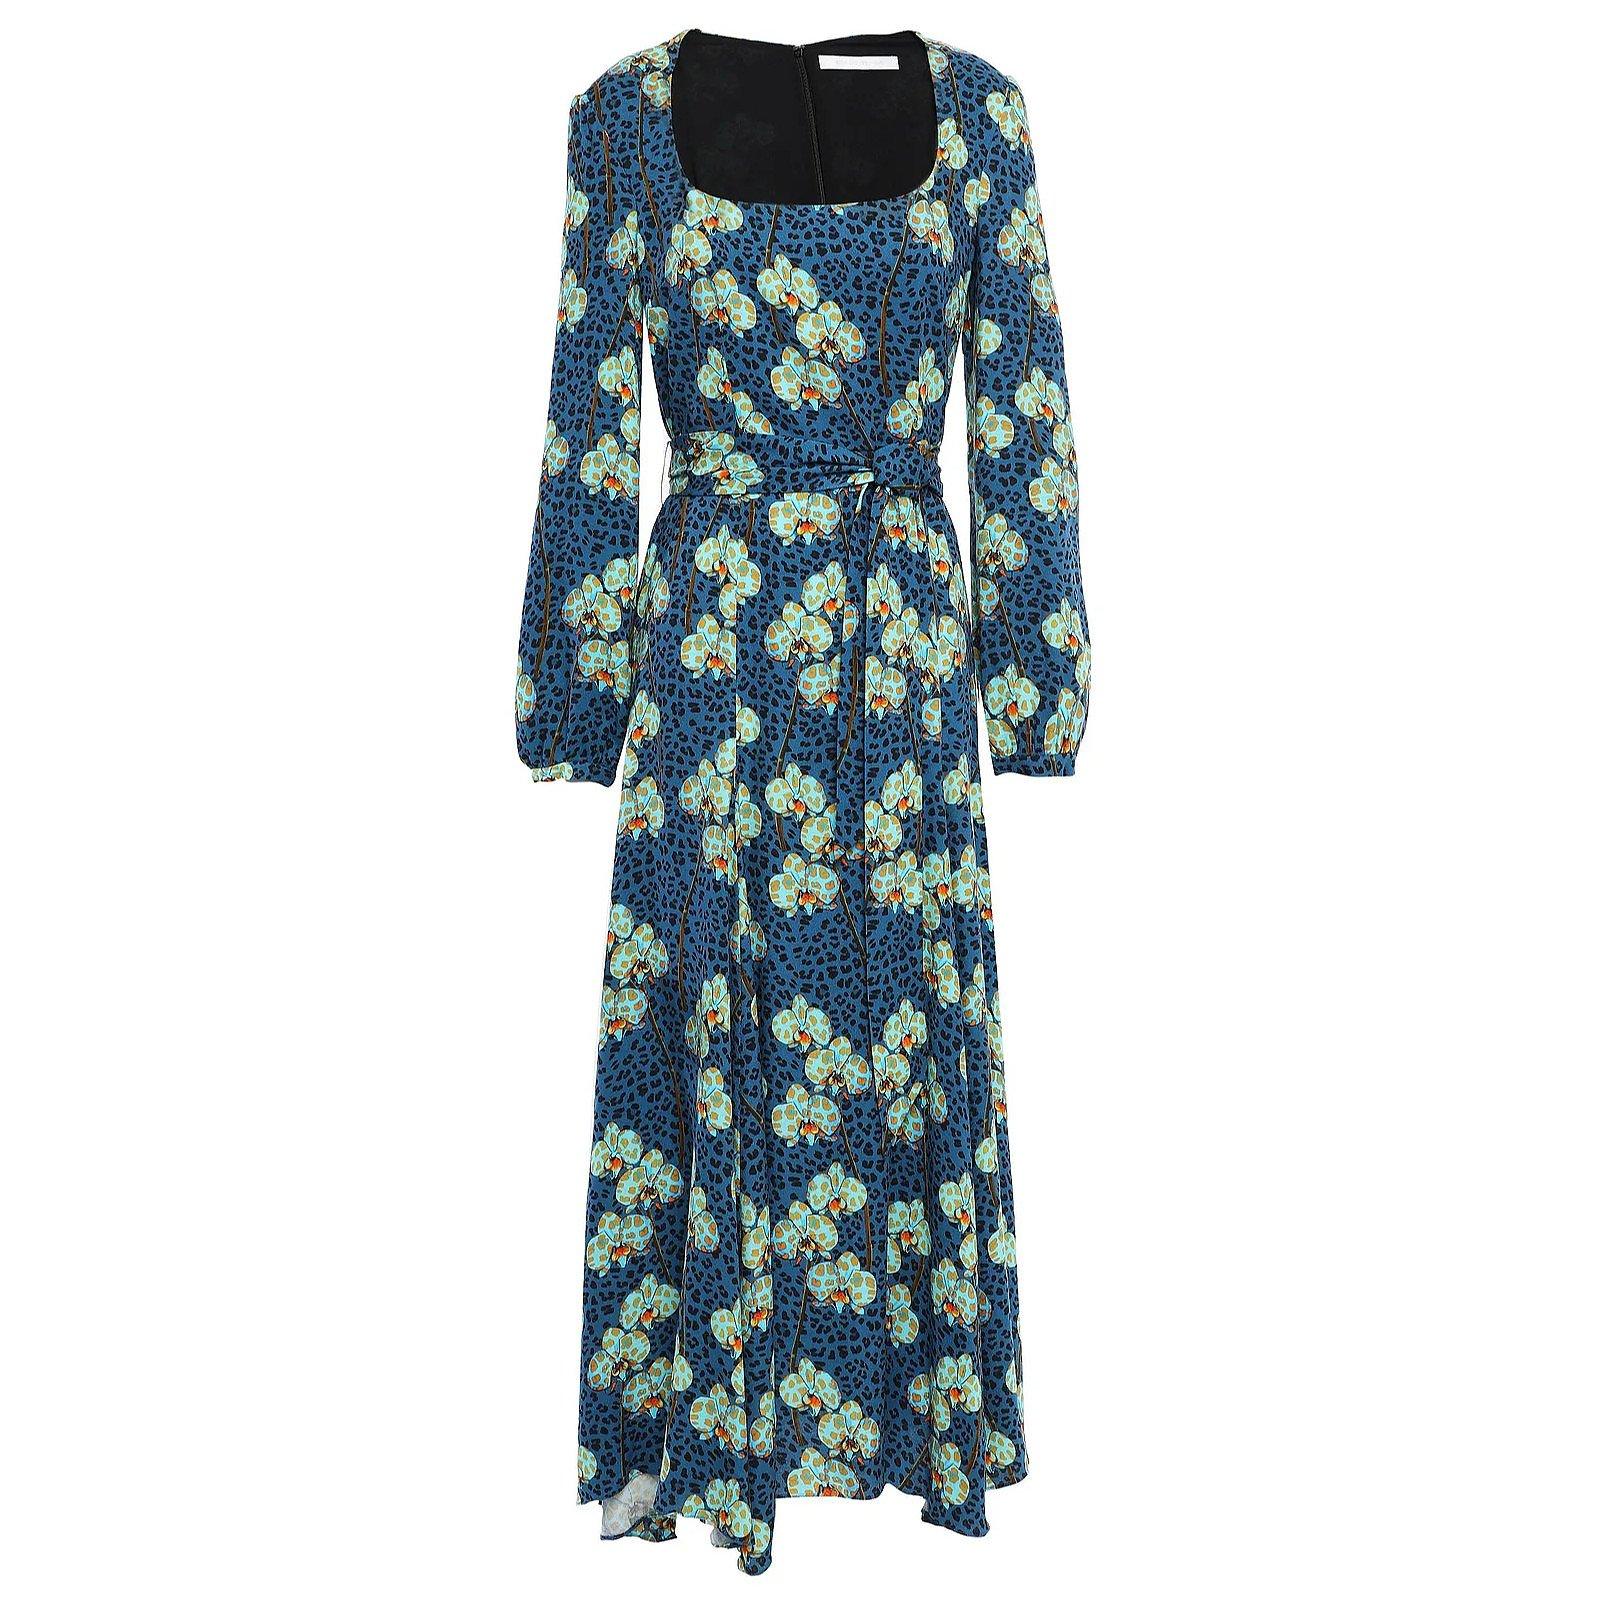 Borgo De Nor Annabella Floral Print Dress